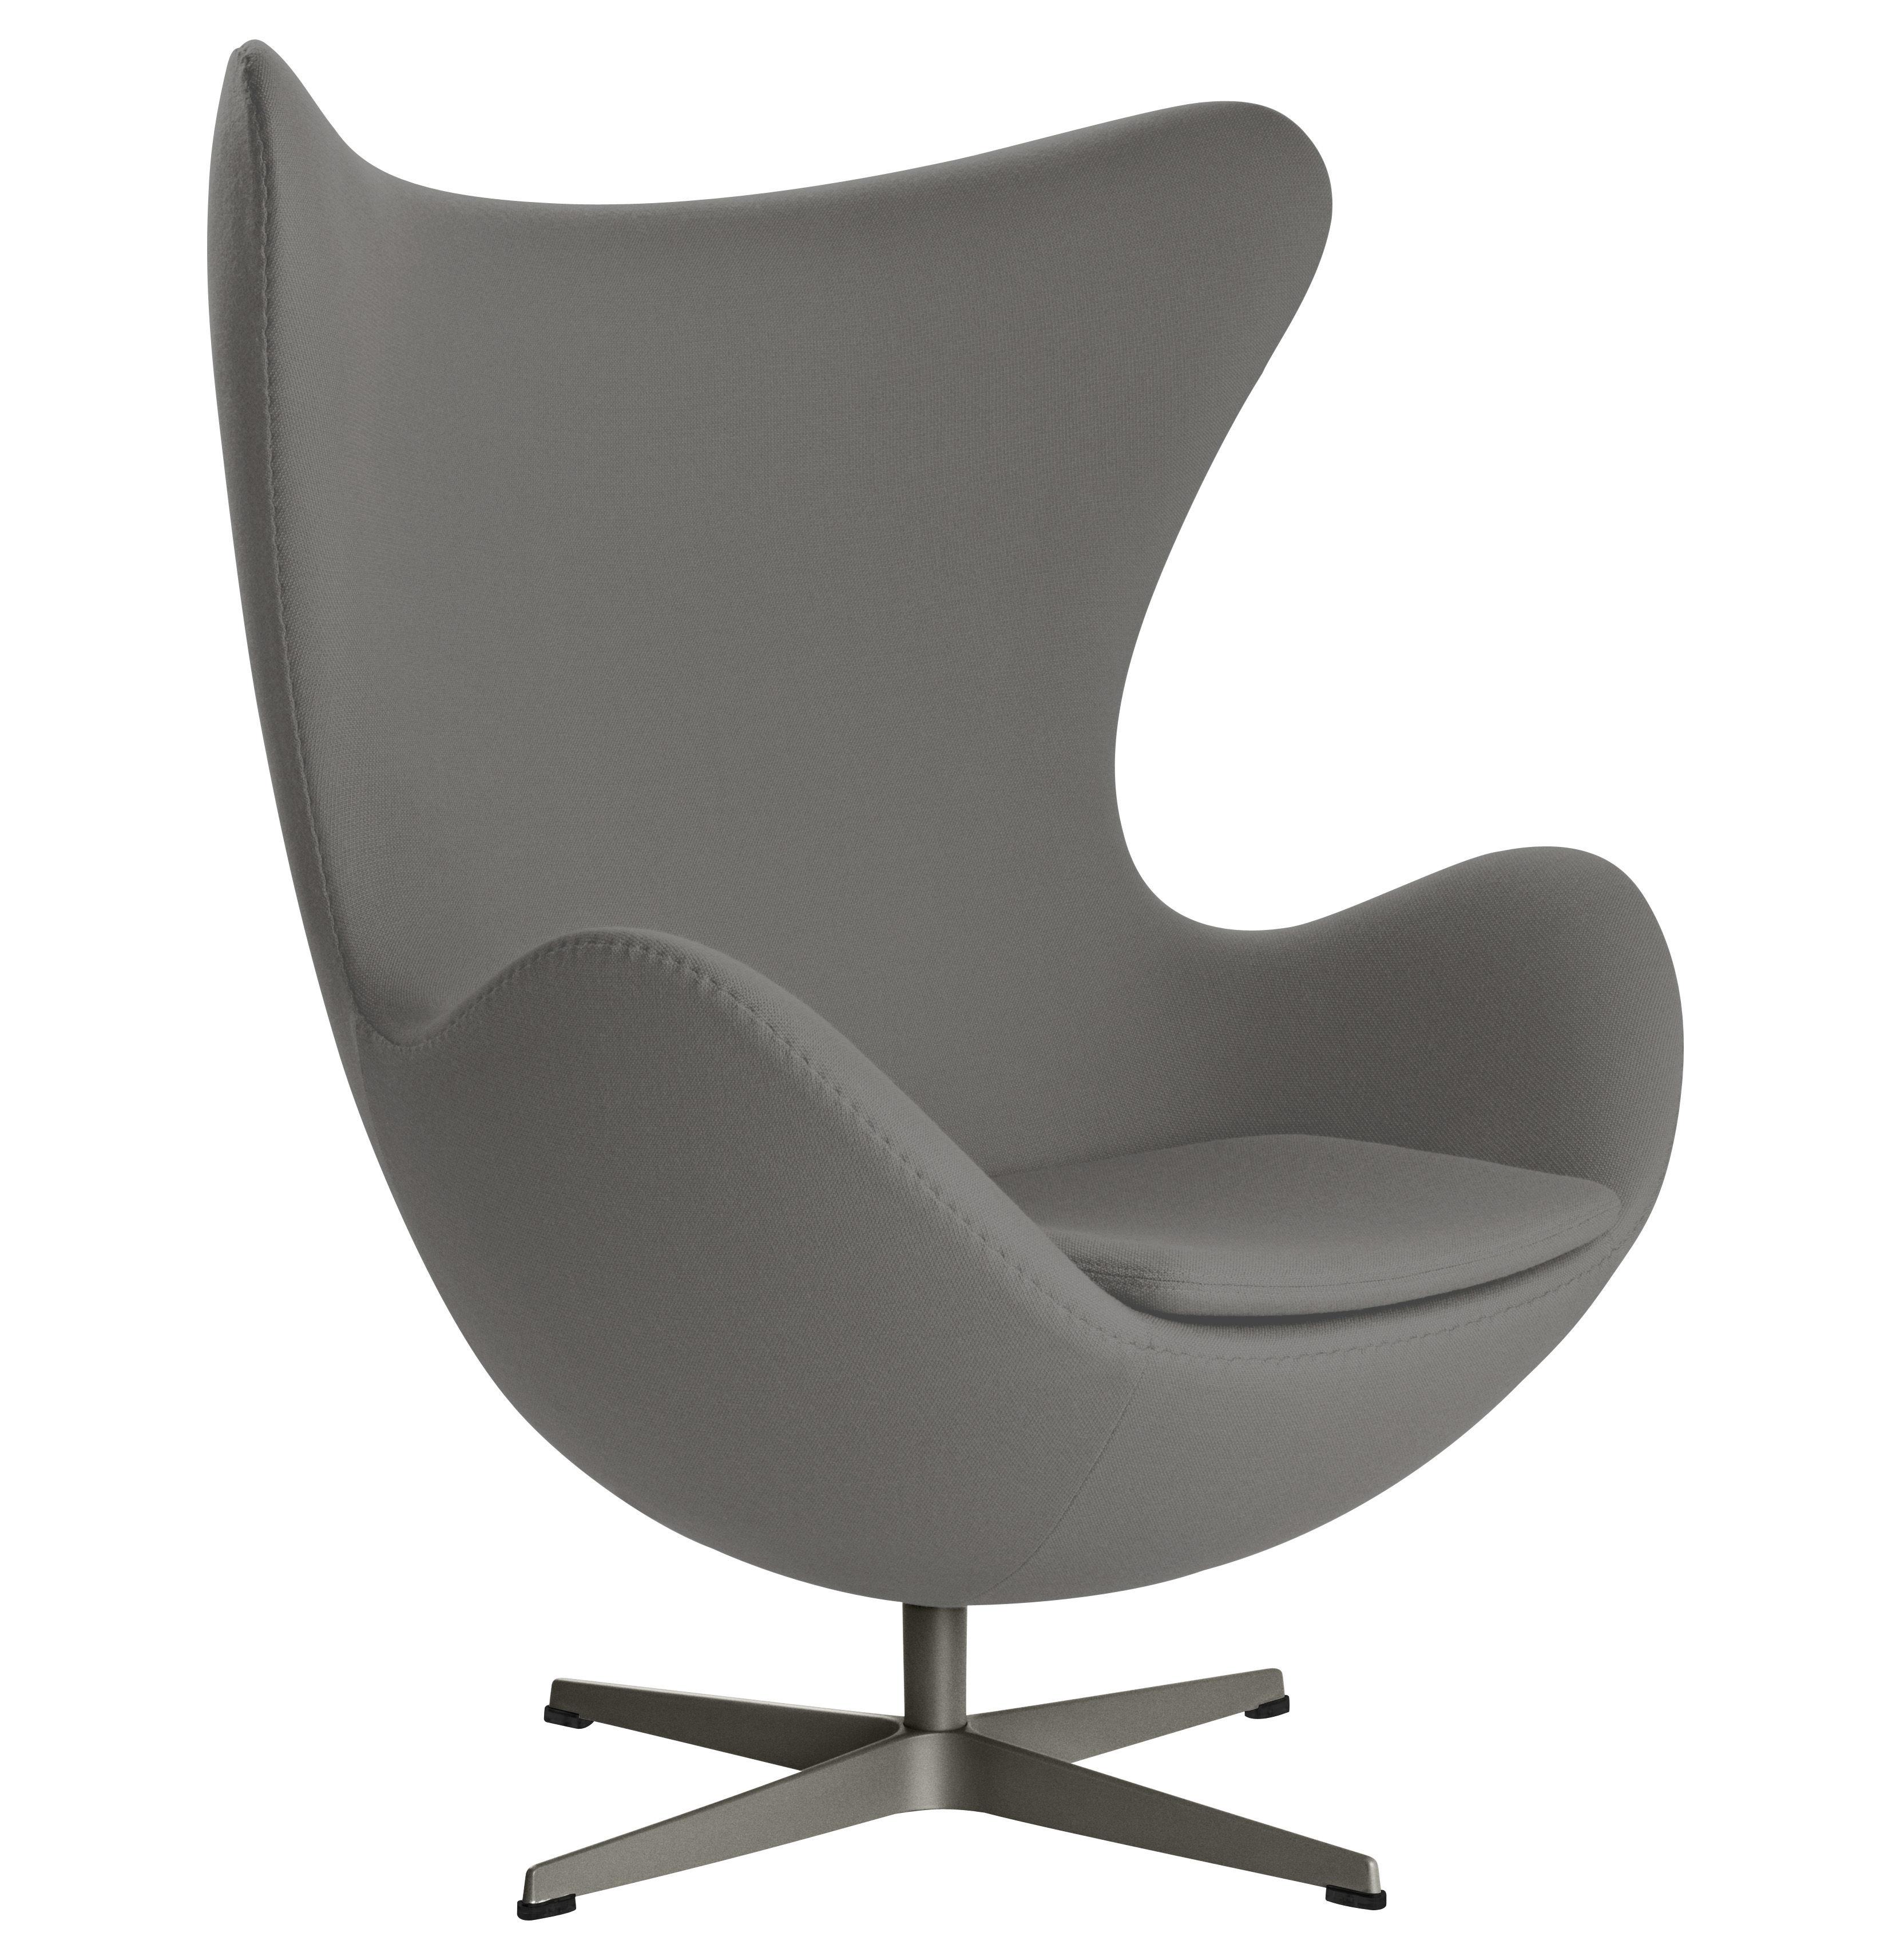 The Egg Chair.Egg Chair Swivel Armchair Gabriele Fabricby Fritz Hansen